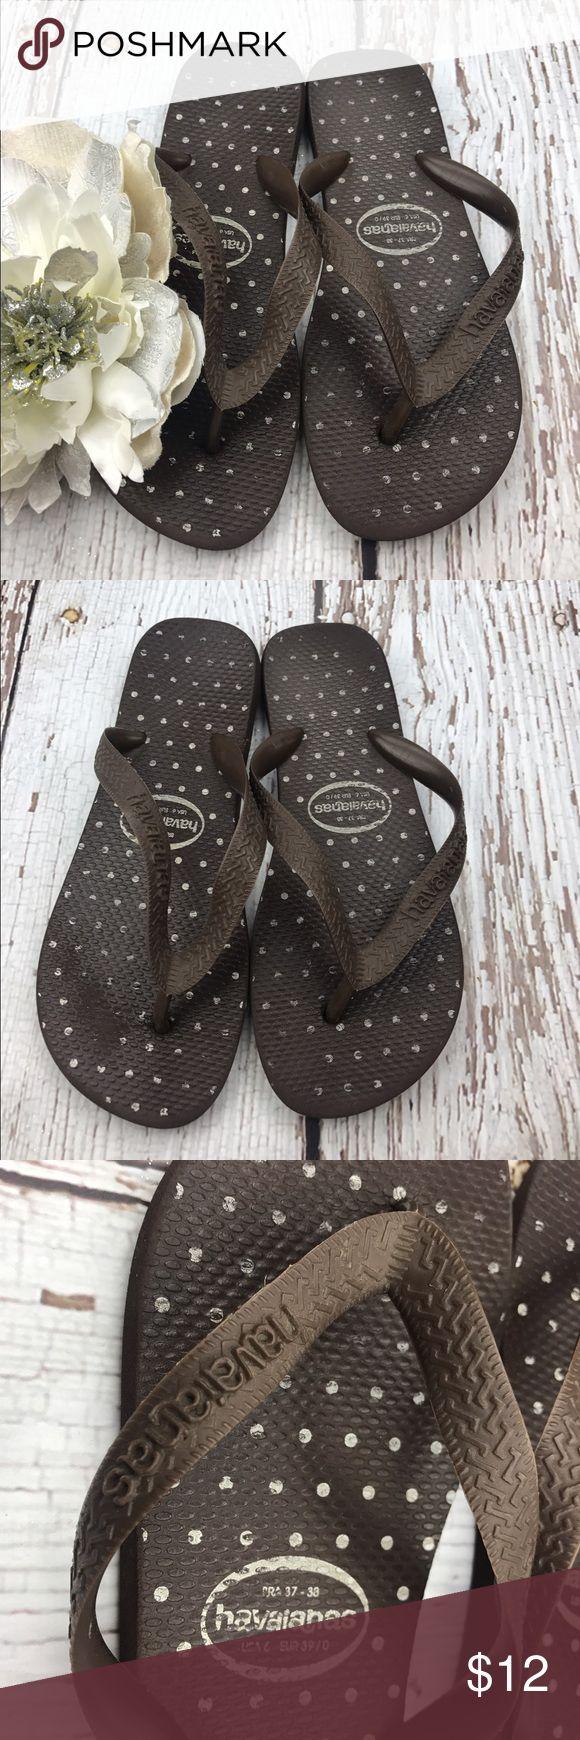 💕SALE💕 Havaianas Chocolate Brown Polka Dot Flip Fantastic 💕 Havaianas Chocolate Brown Polka Dot Flip Flops Havaianas Shoes Sandals